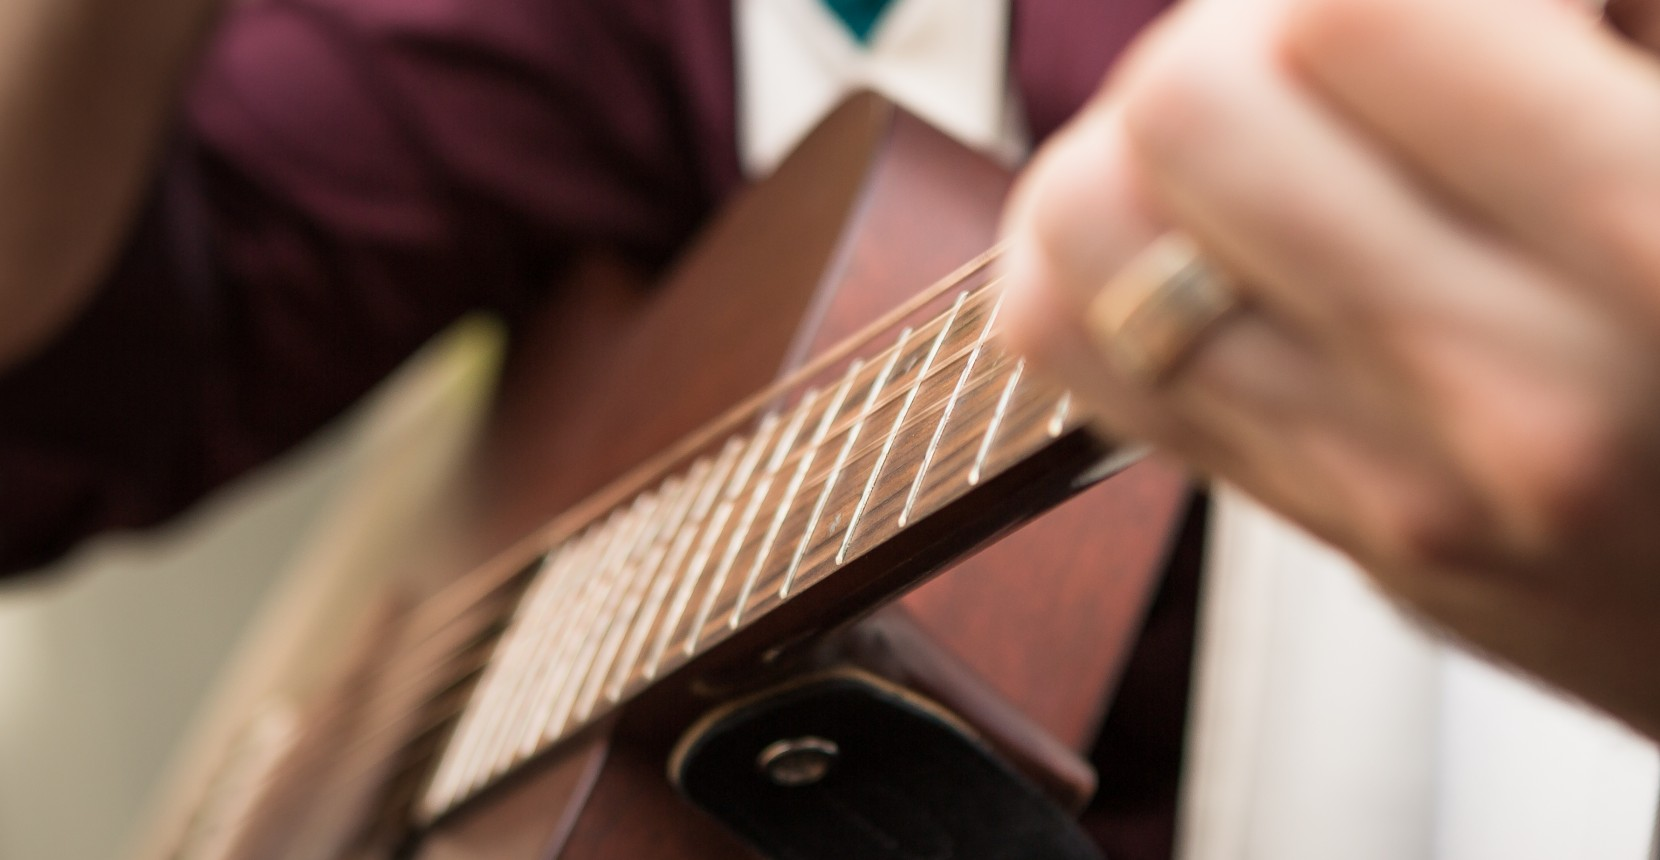 Cantor Michael Smolash playing guitar